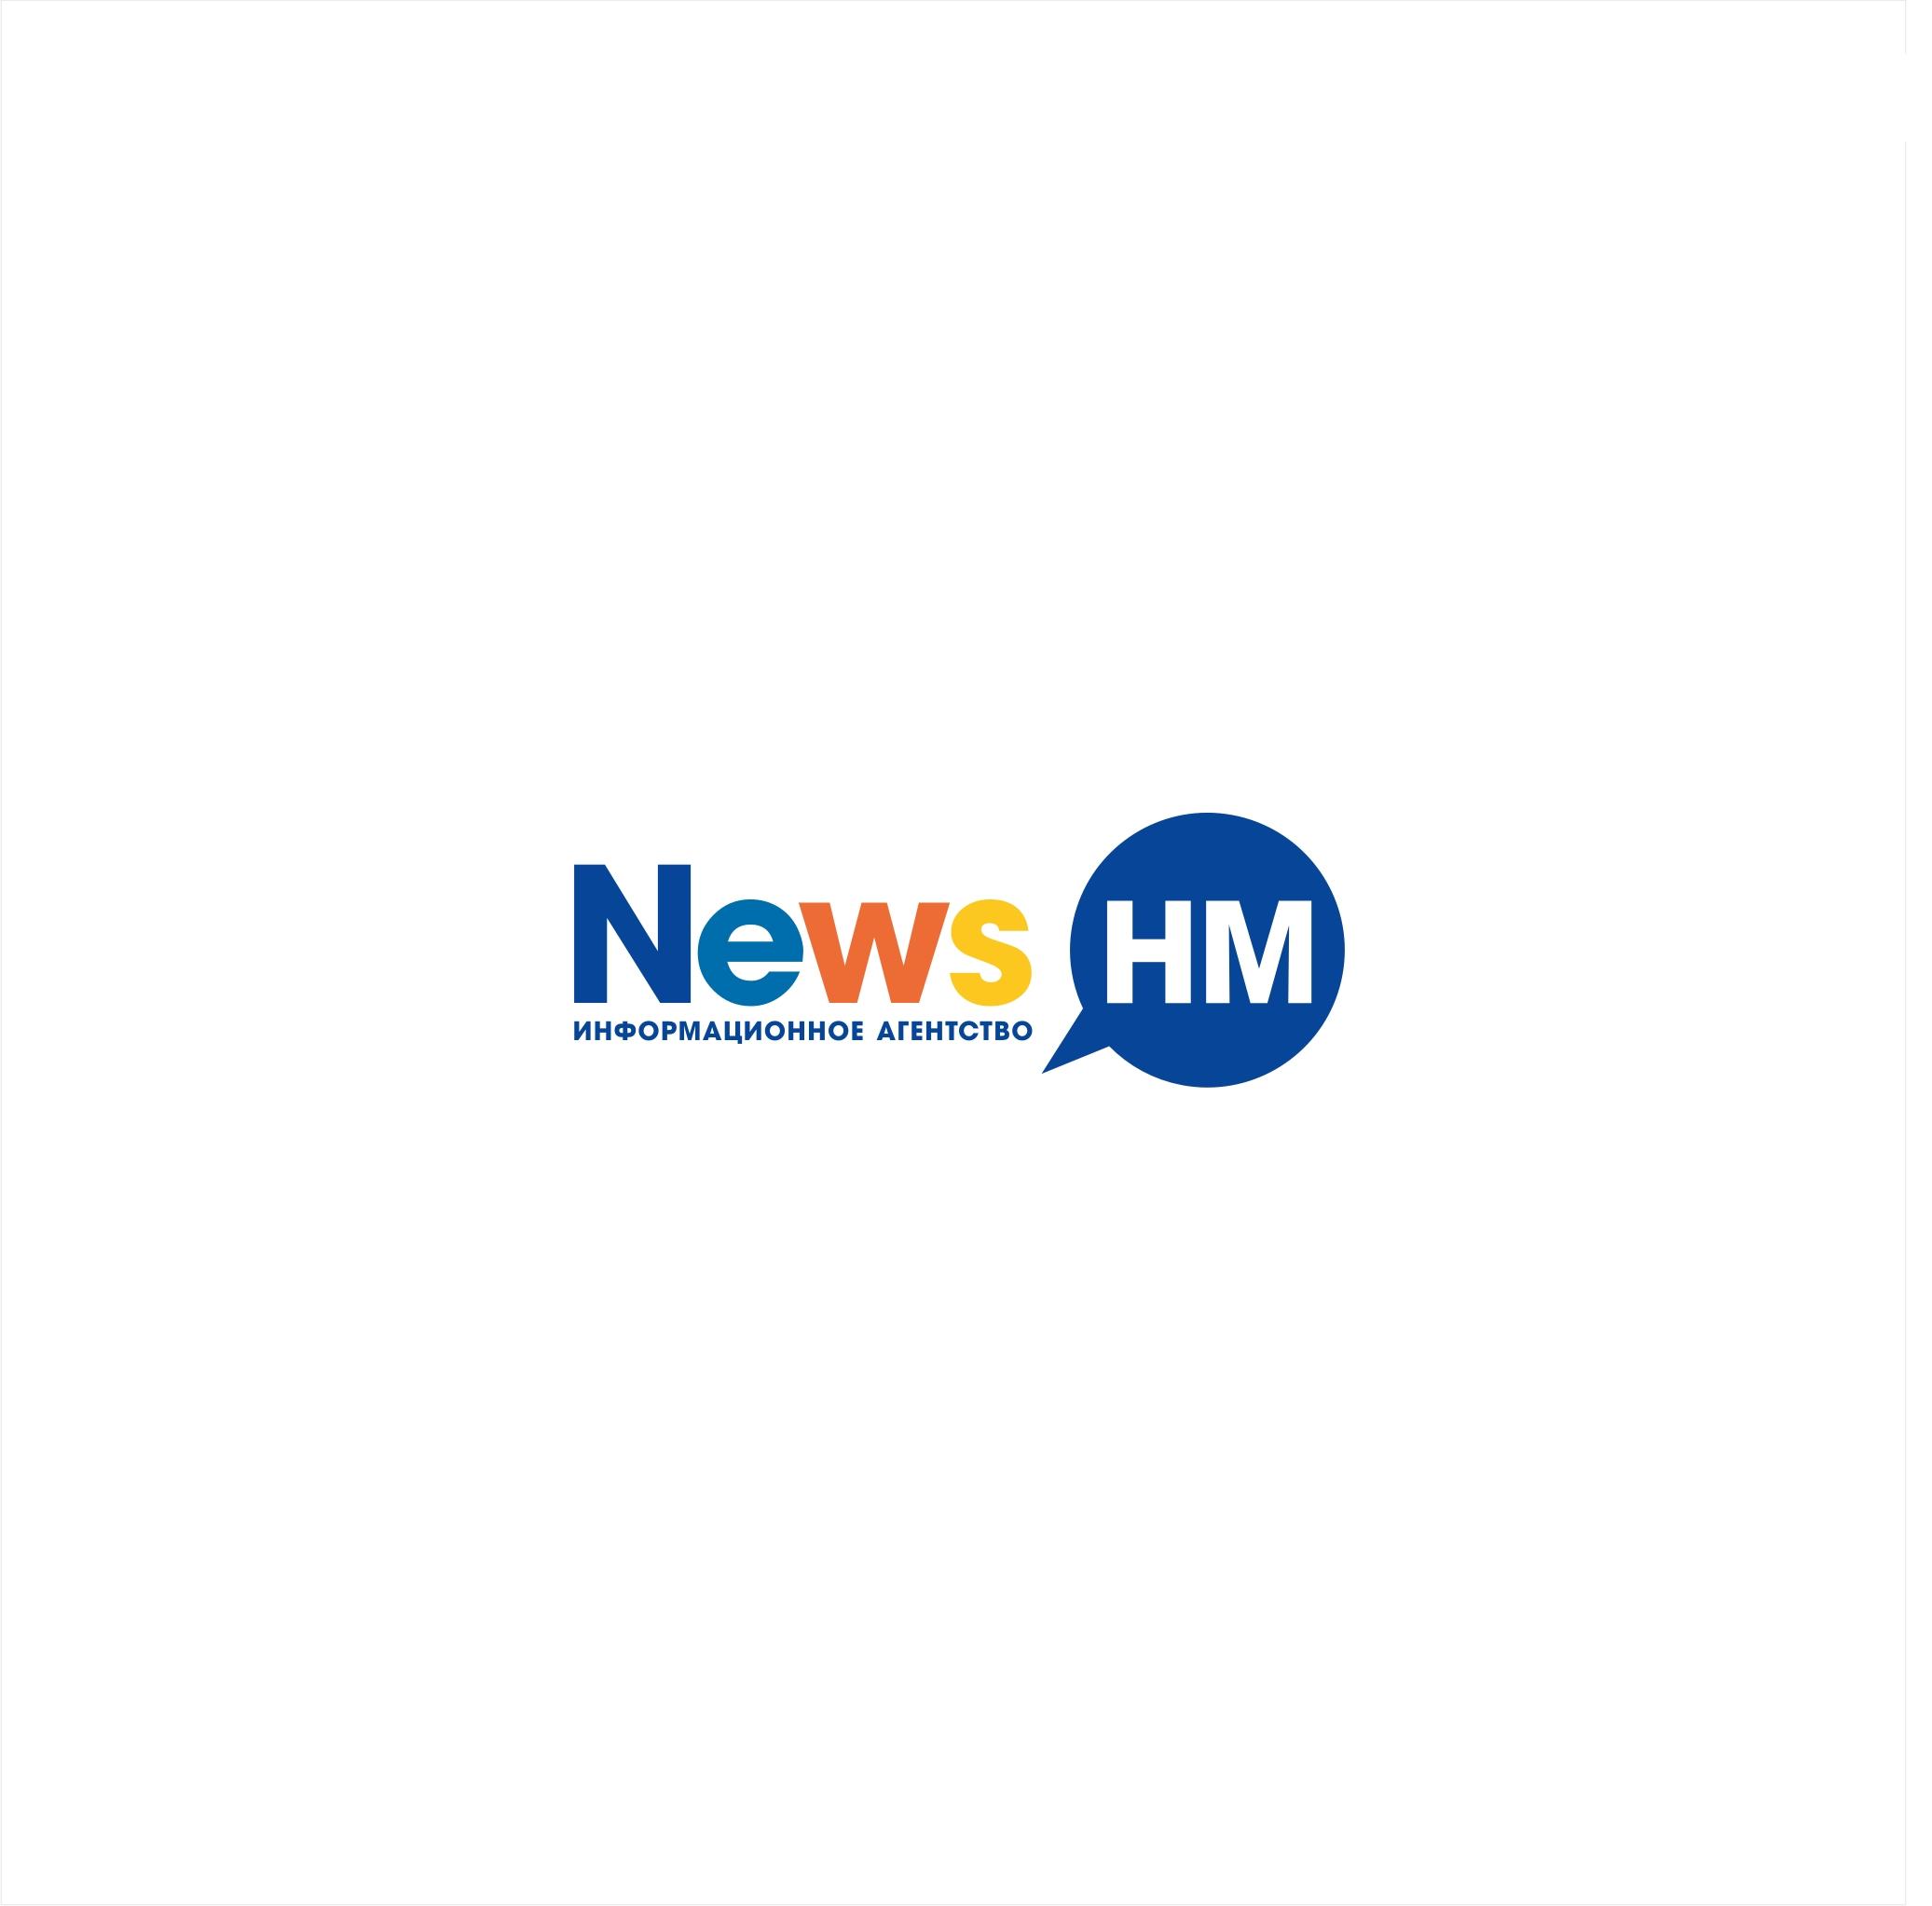 Логотип для информационного агентства фото f_5035aa6985326ec4.jpg